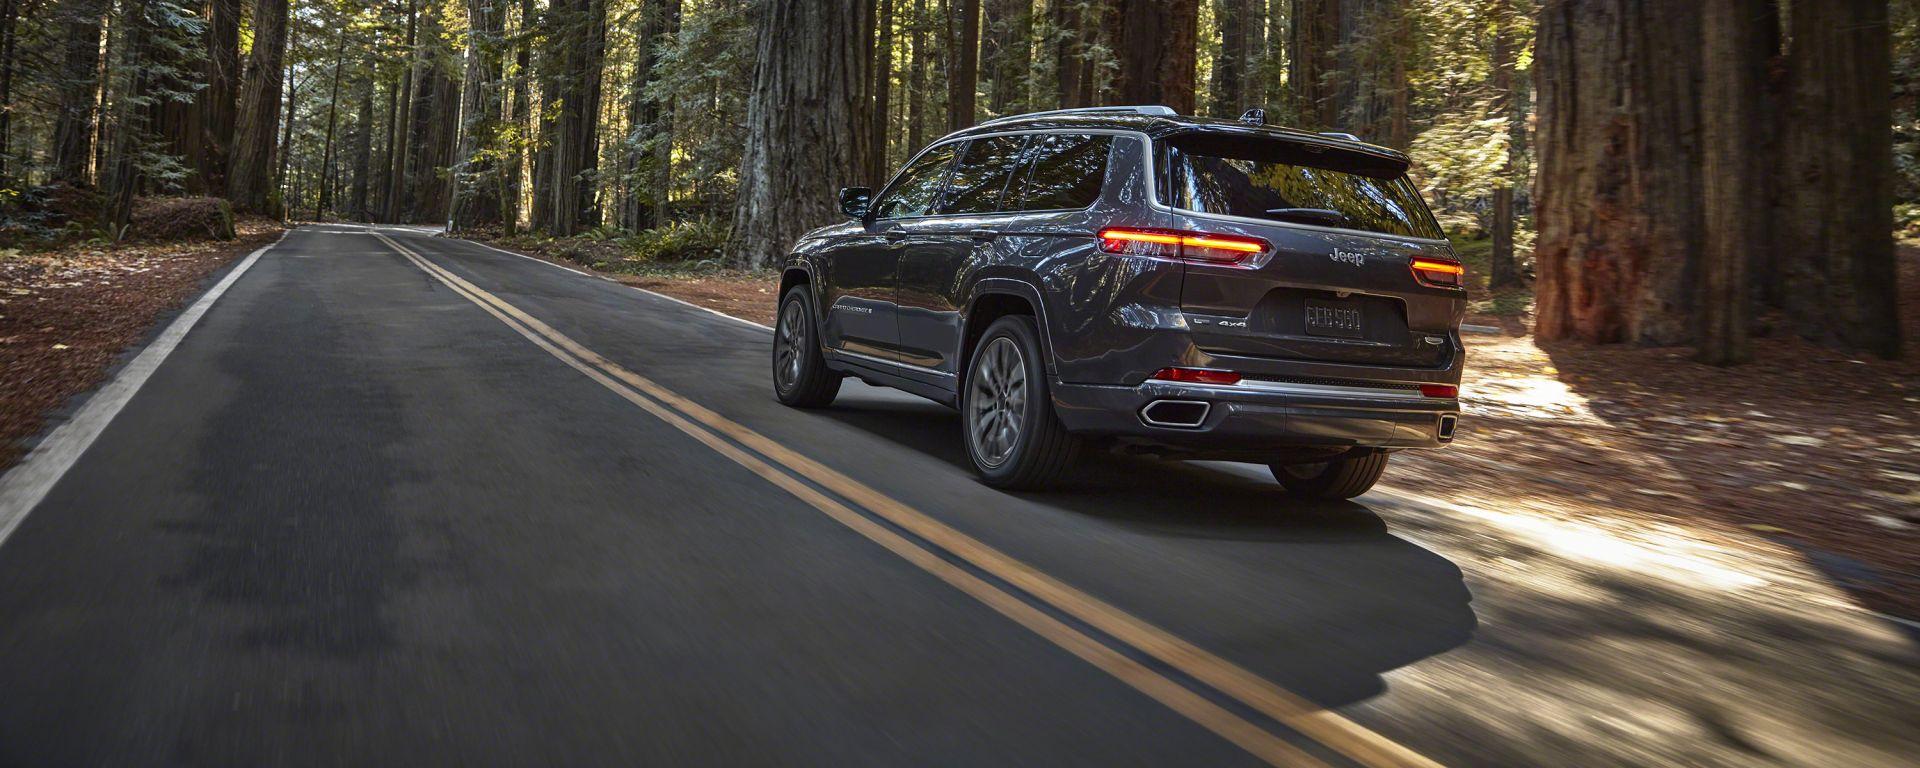 Nuova Jeep Grand Cherokee L 2021